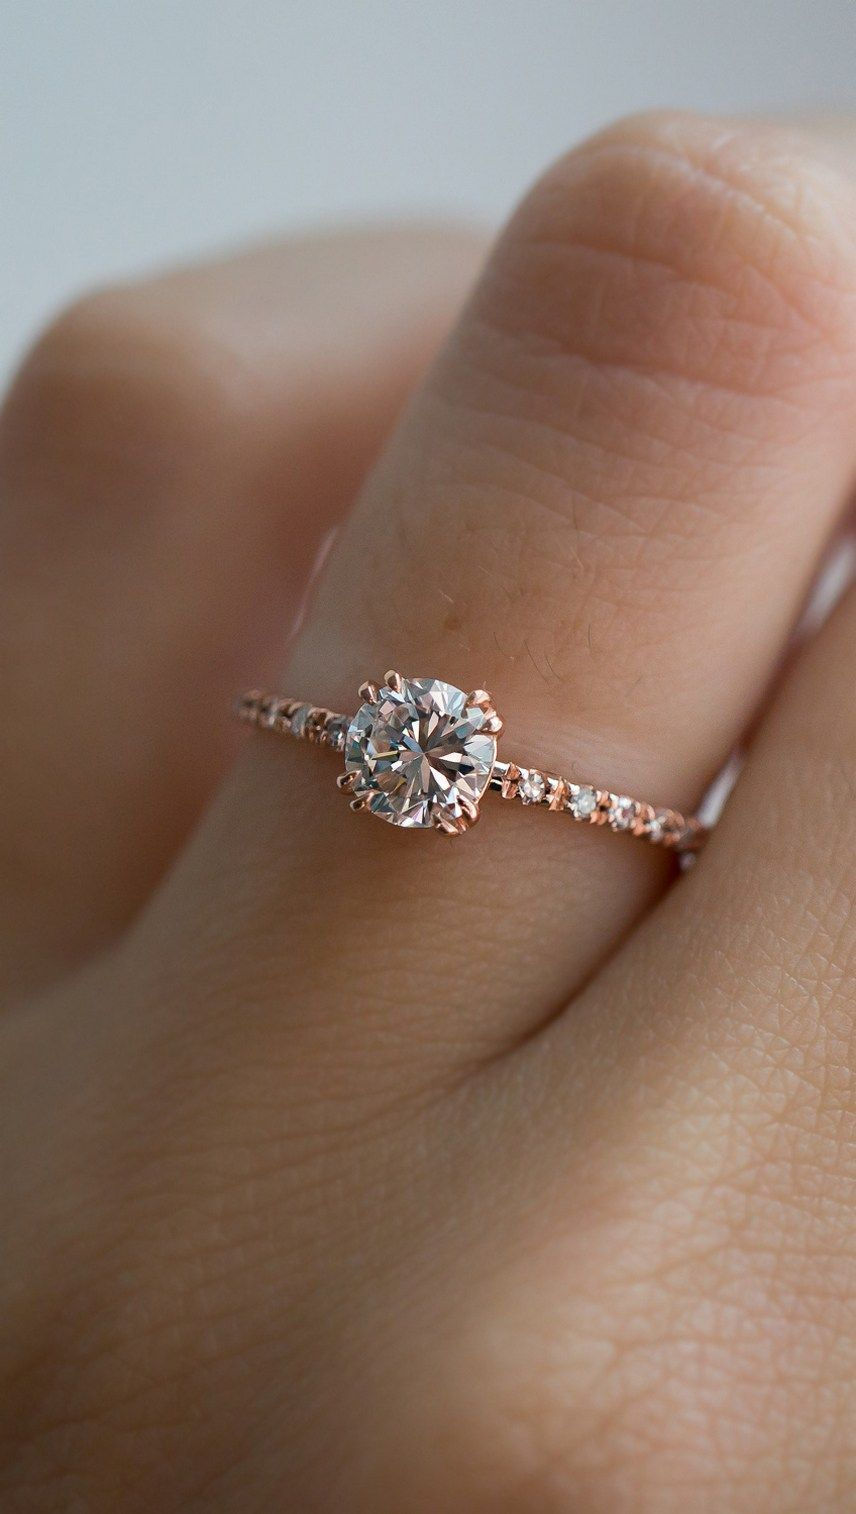 100 Simple Vintage Engagement Rings Inspiration (75)   Engagement ...